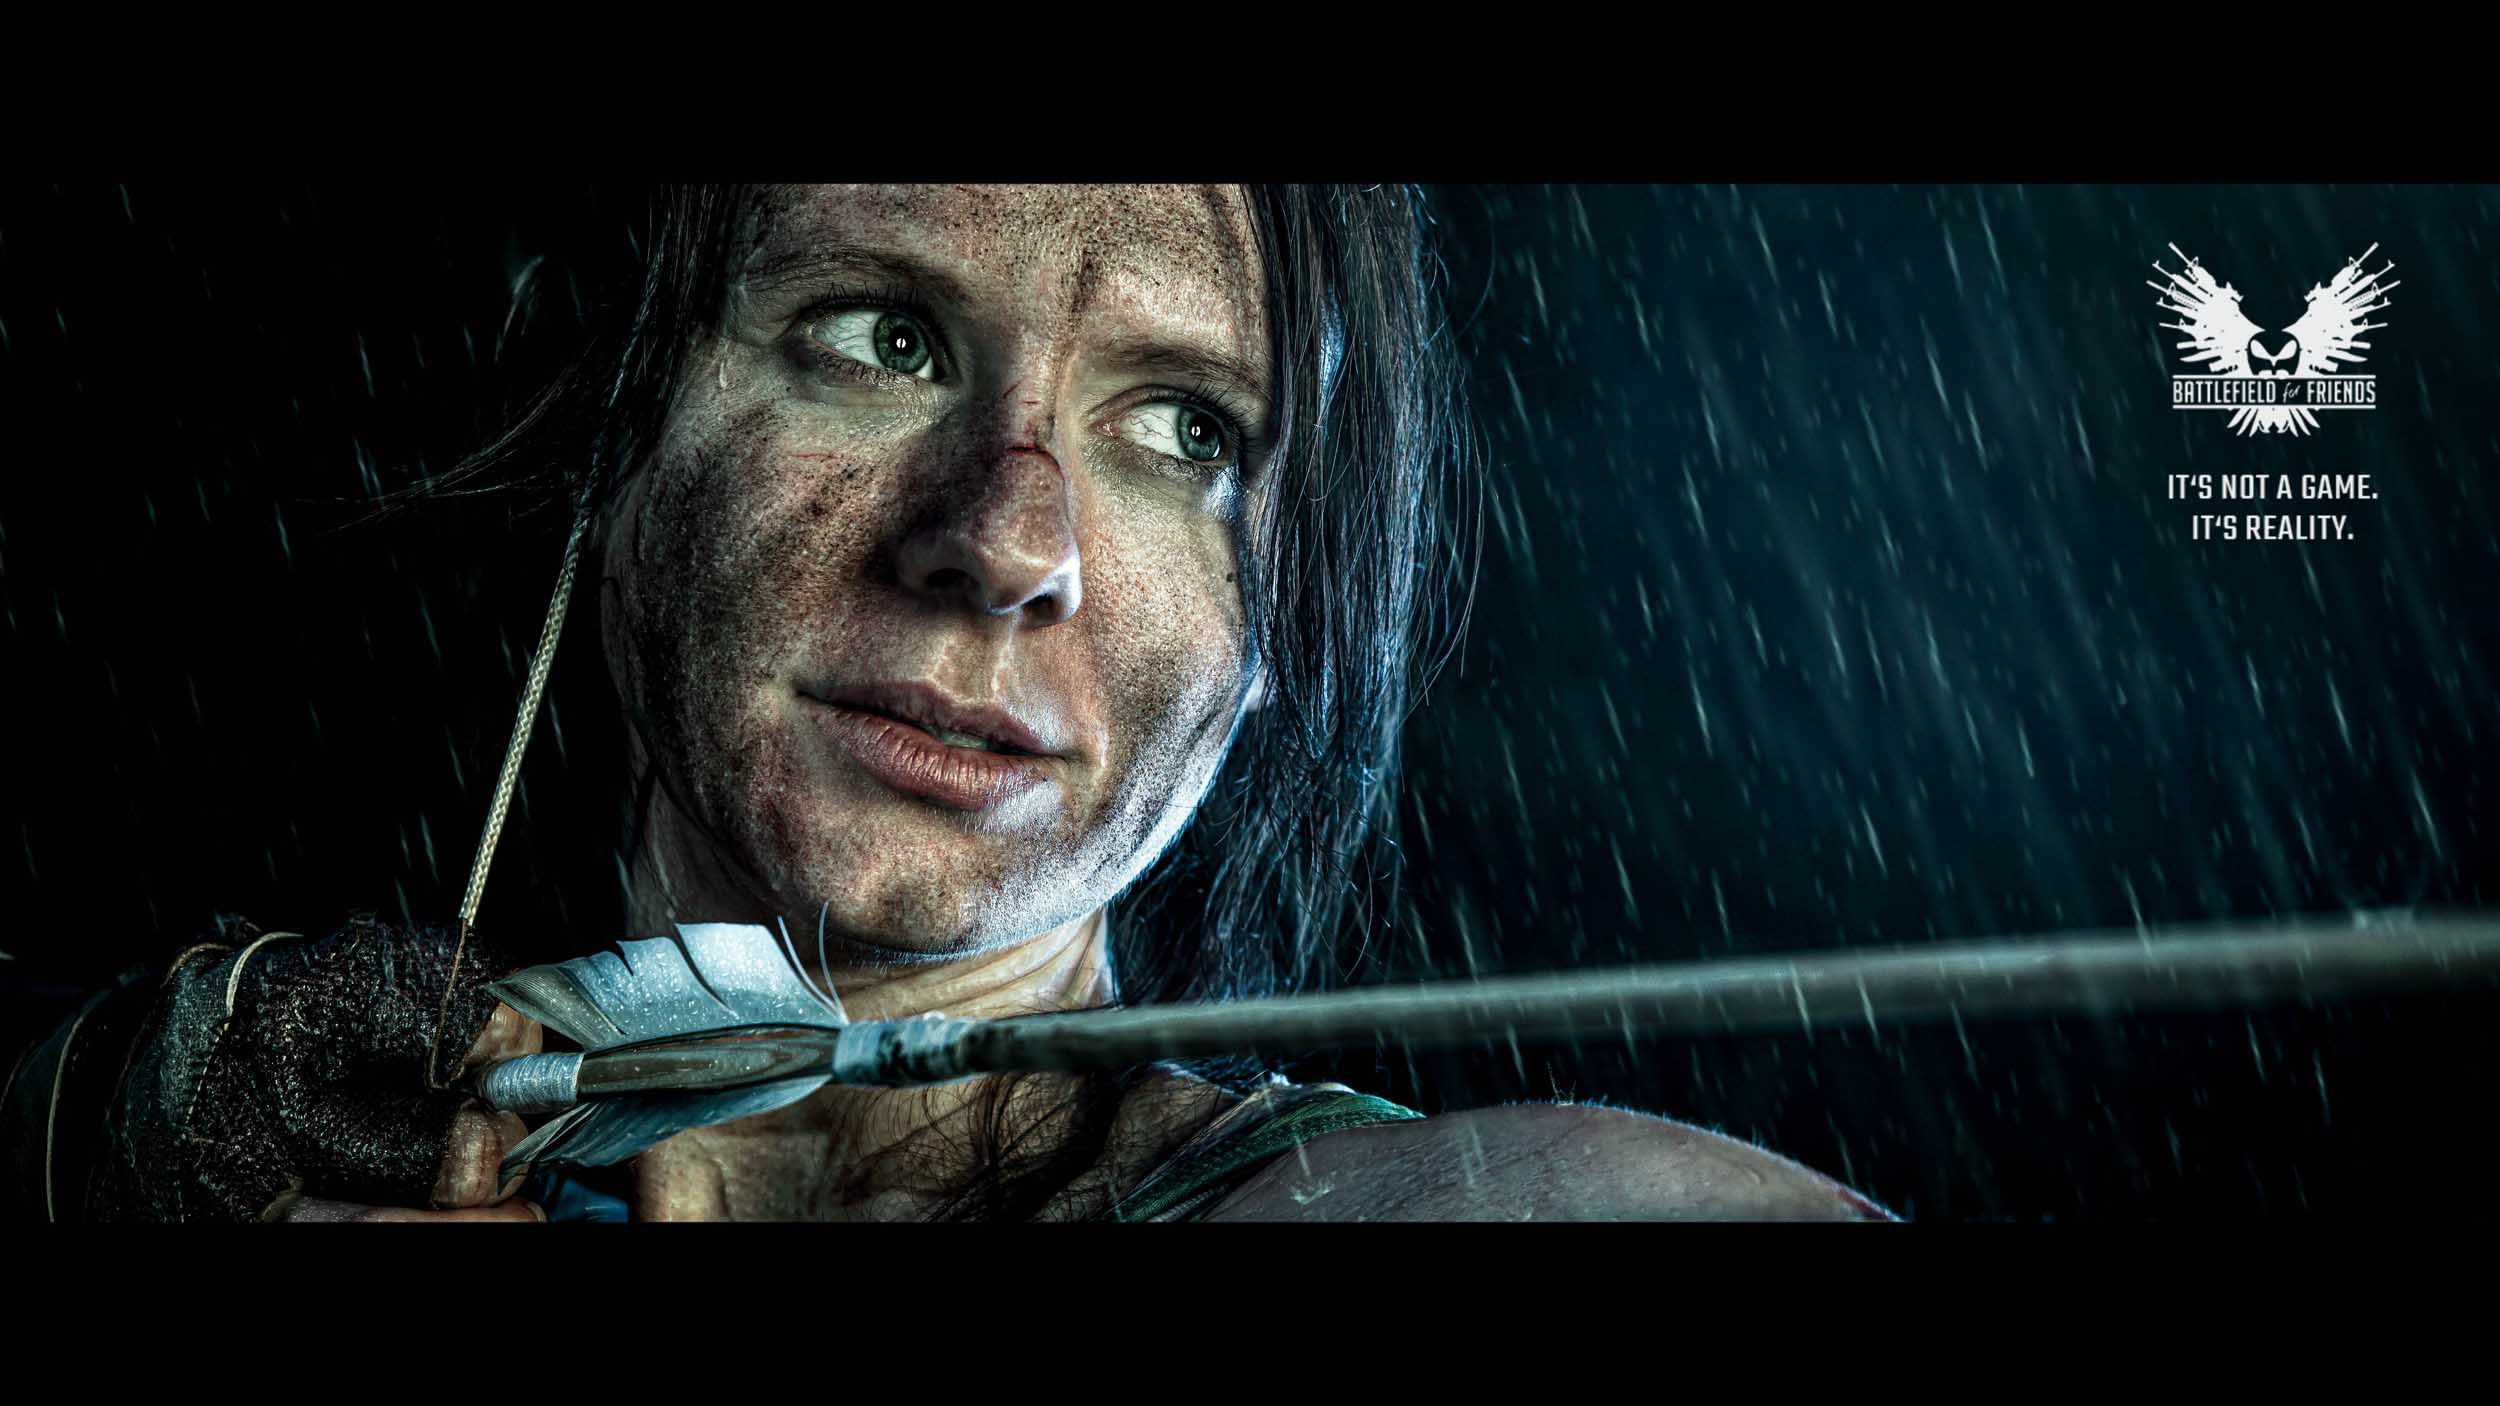 Tomb Raider. Portrait of woman, Lara Croft-like character.